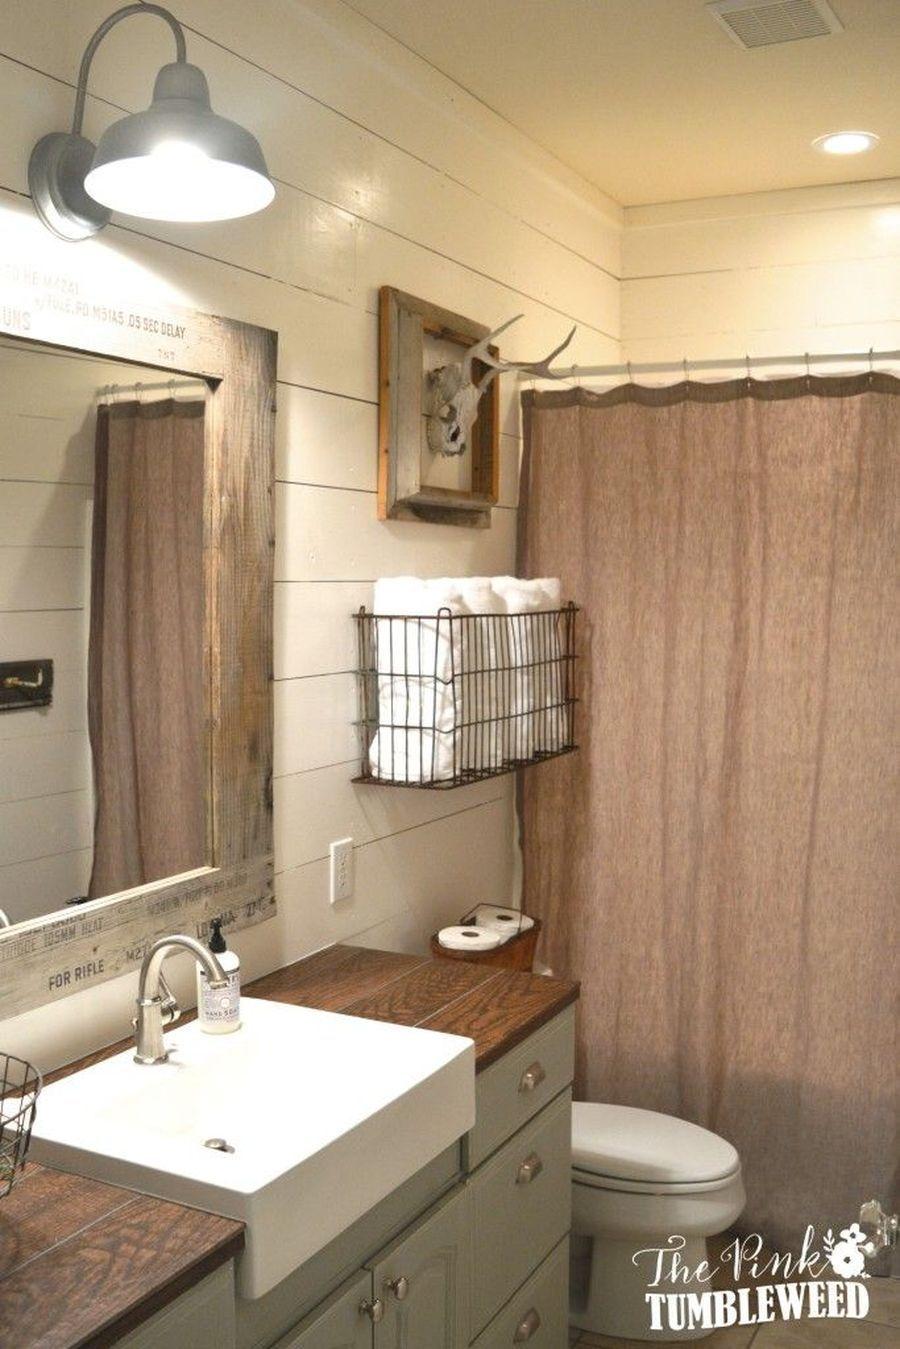 60 Rustic Farmhouse Style Bathroom Design Ideas  Https://amzhouse.com/60 Rustic Farmhouse Style Bathroom Design Ideas/